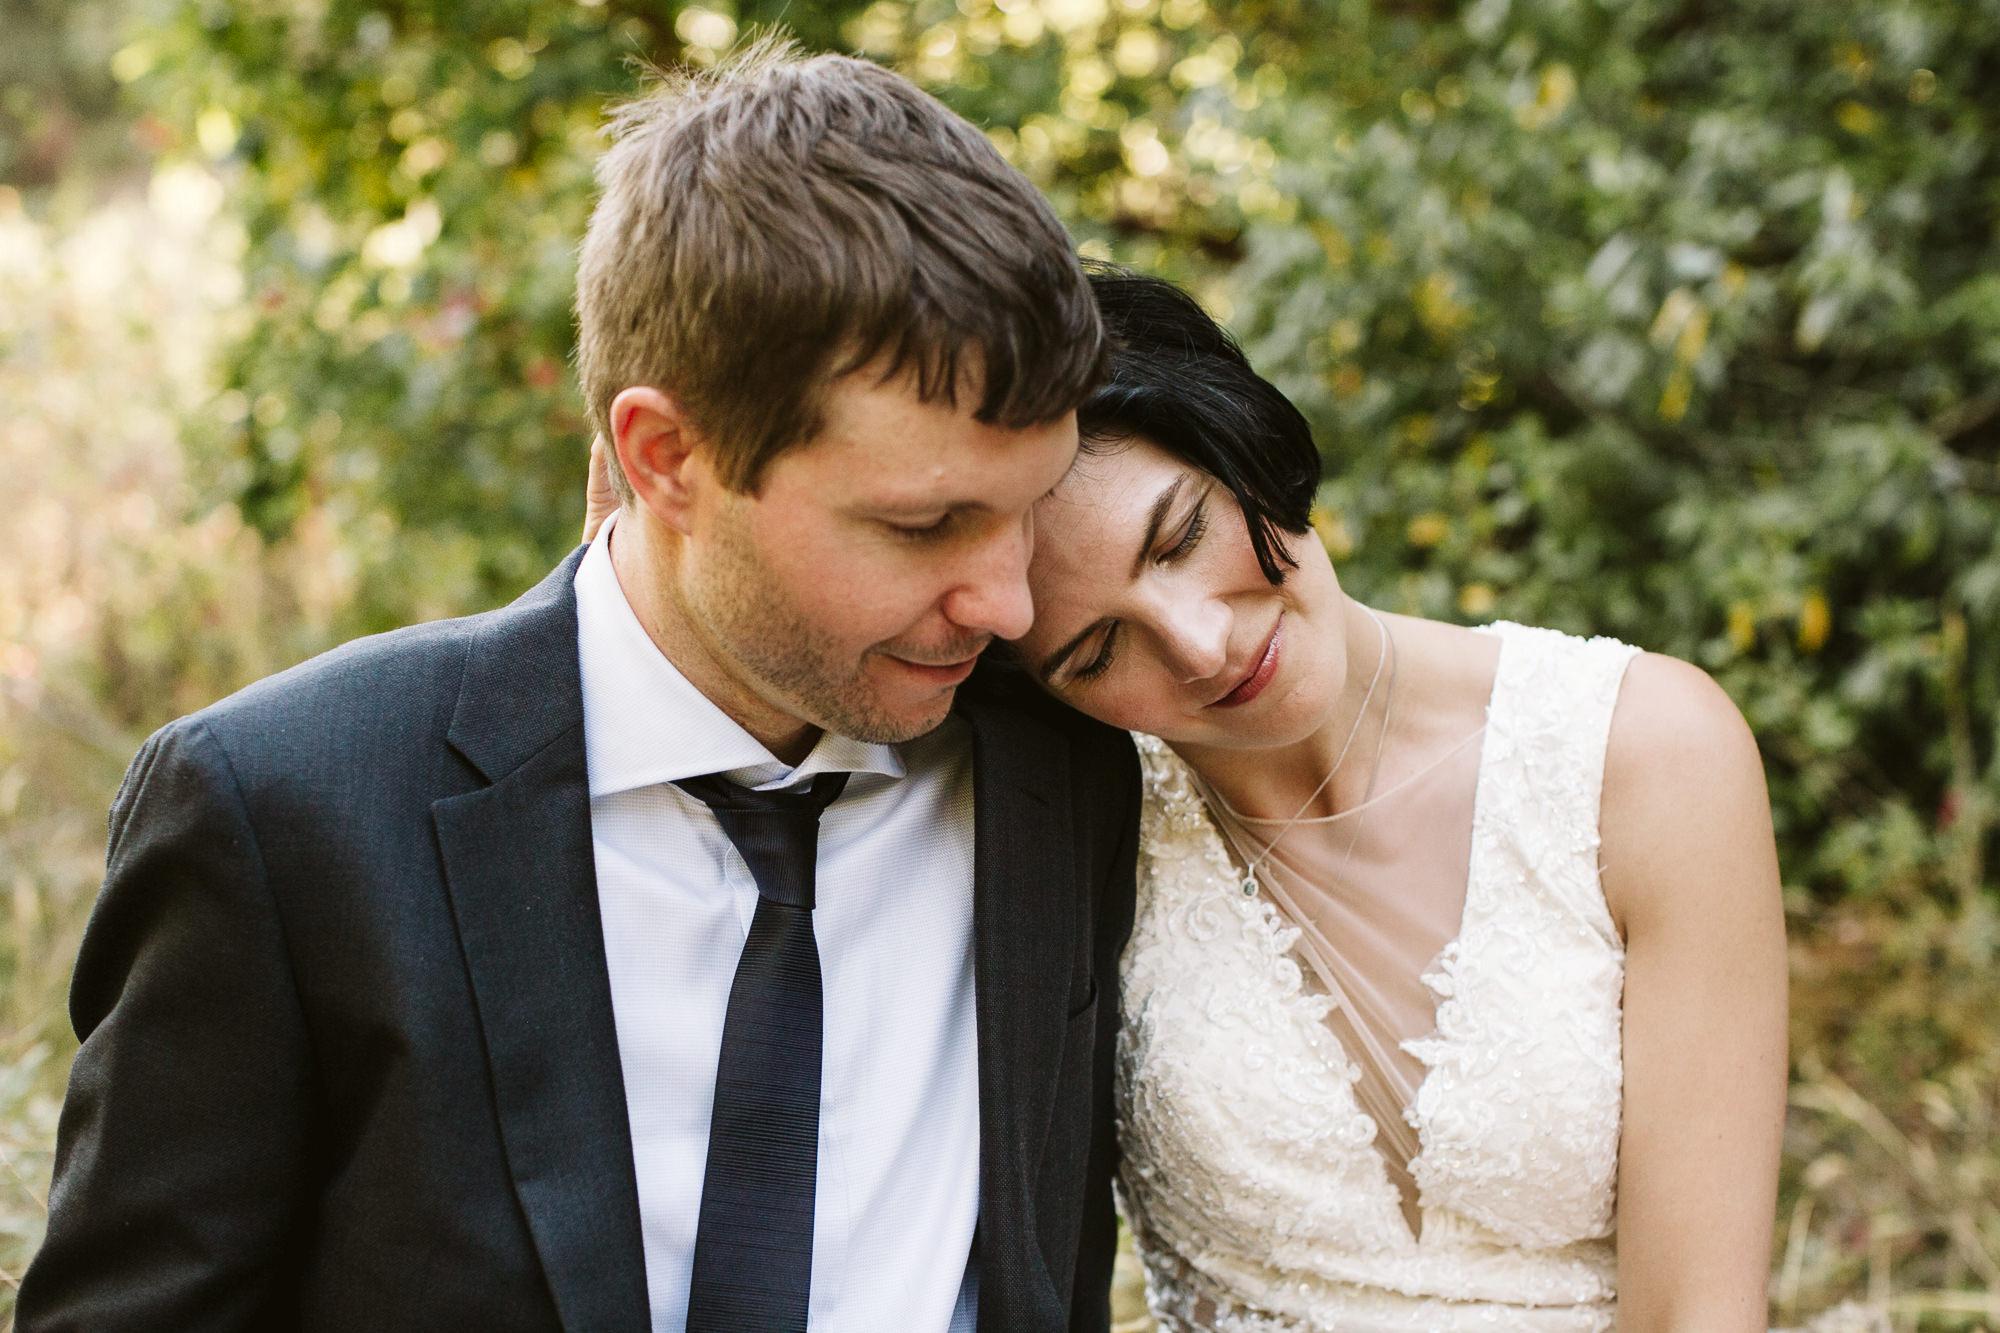 California-wedding-photographer-alfonso-flores-pamplin-groove-278.jpg